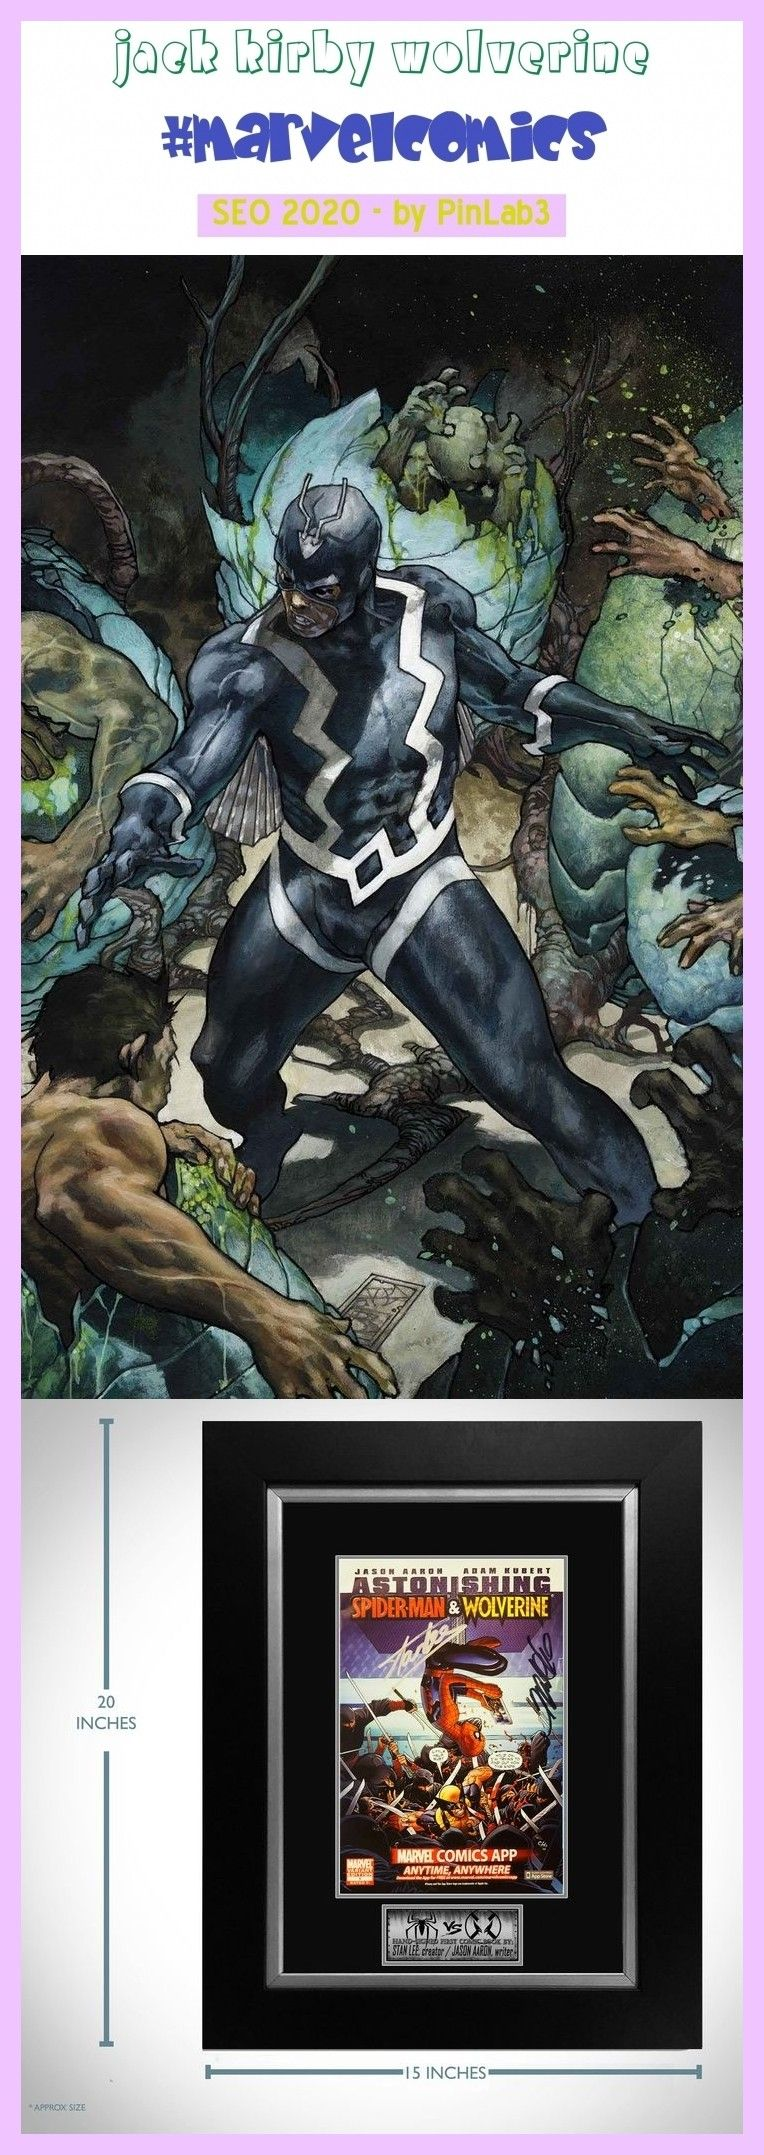 Jack kirby wolverine Jack Kirby Wolverine | Jack kirby wolverine | Jack Kirby Wolverine | jack kirb